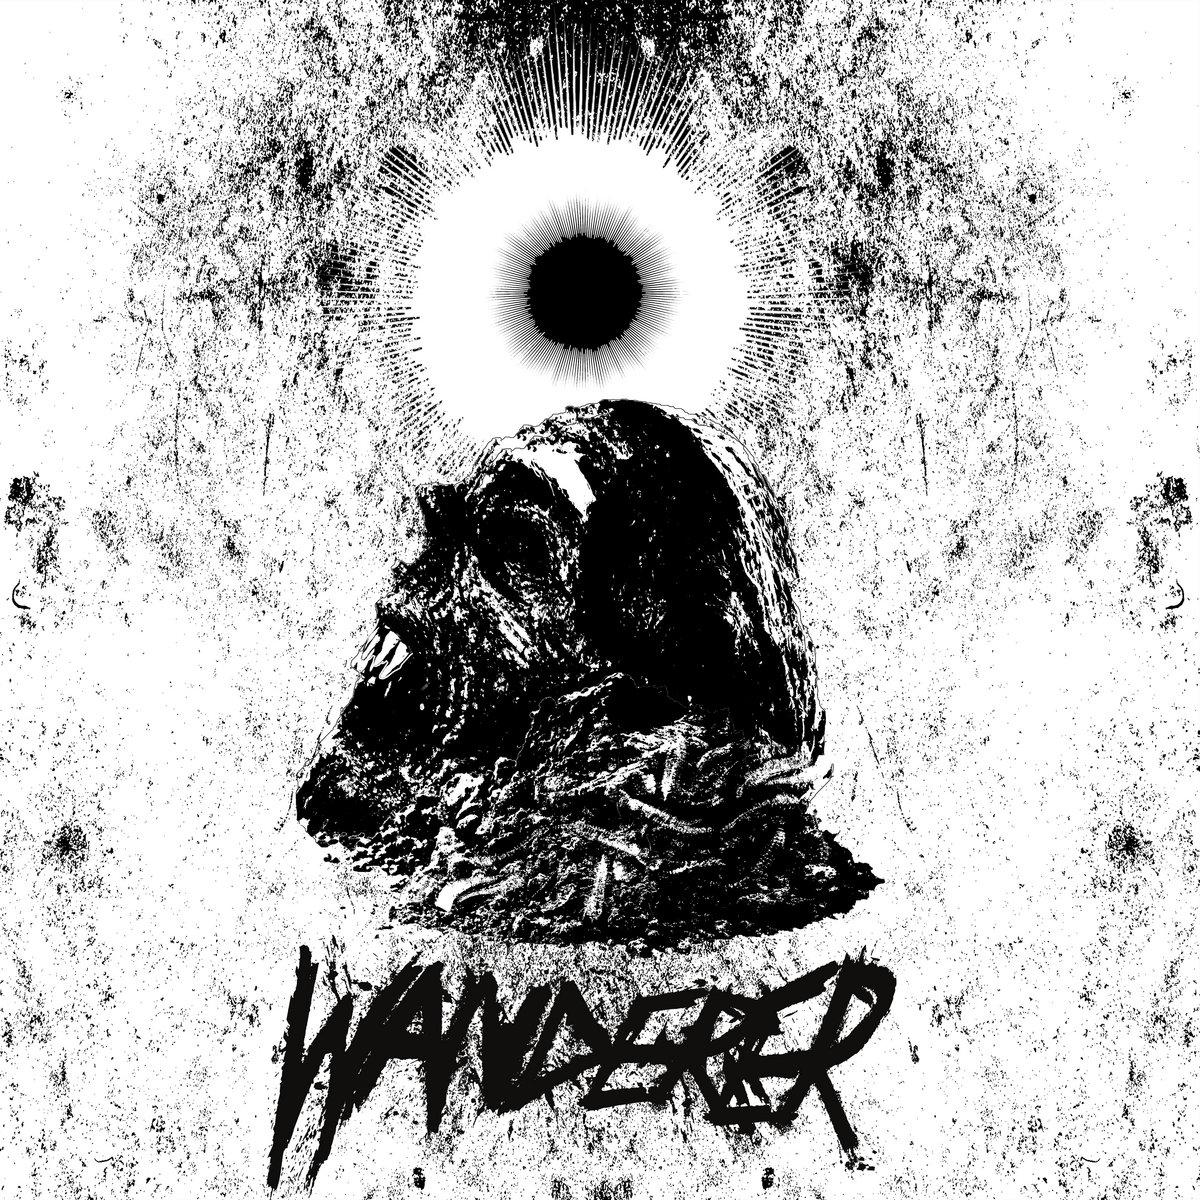 https://wanderermn.bandcamp.com/album/abandoned